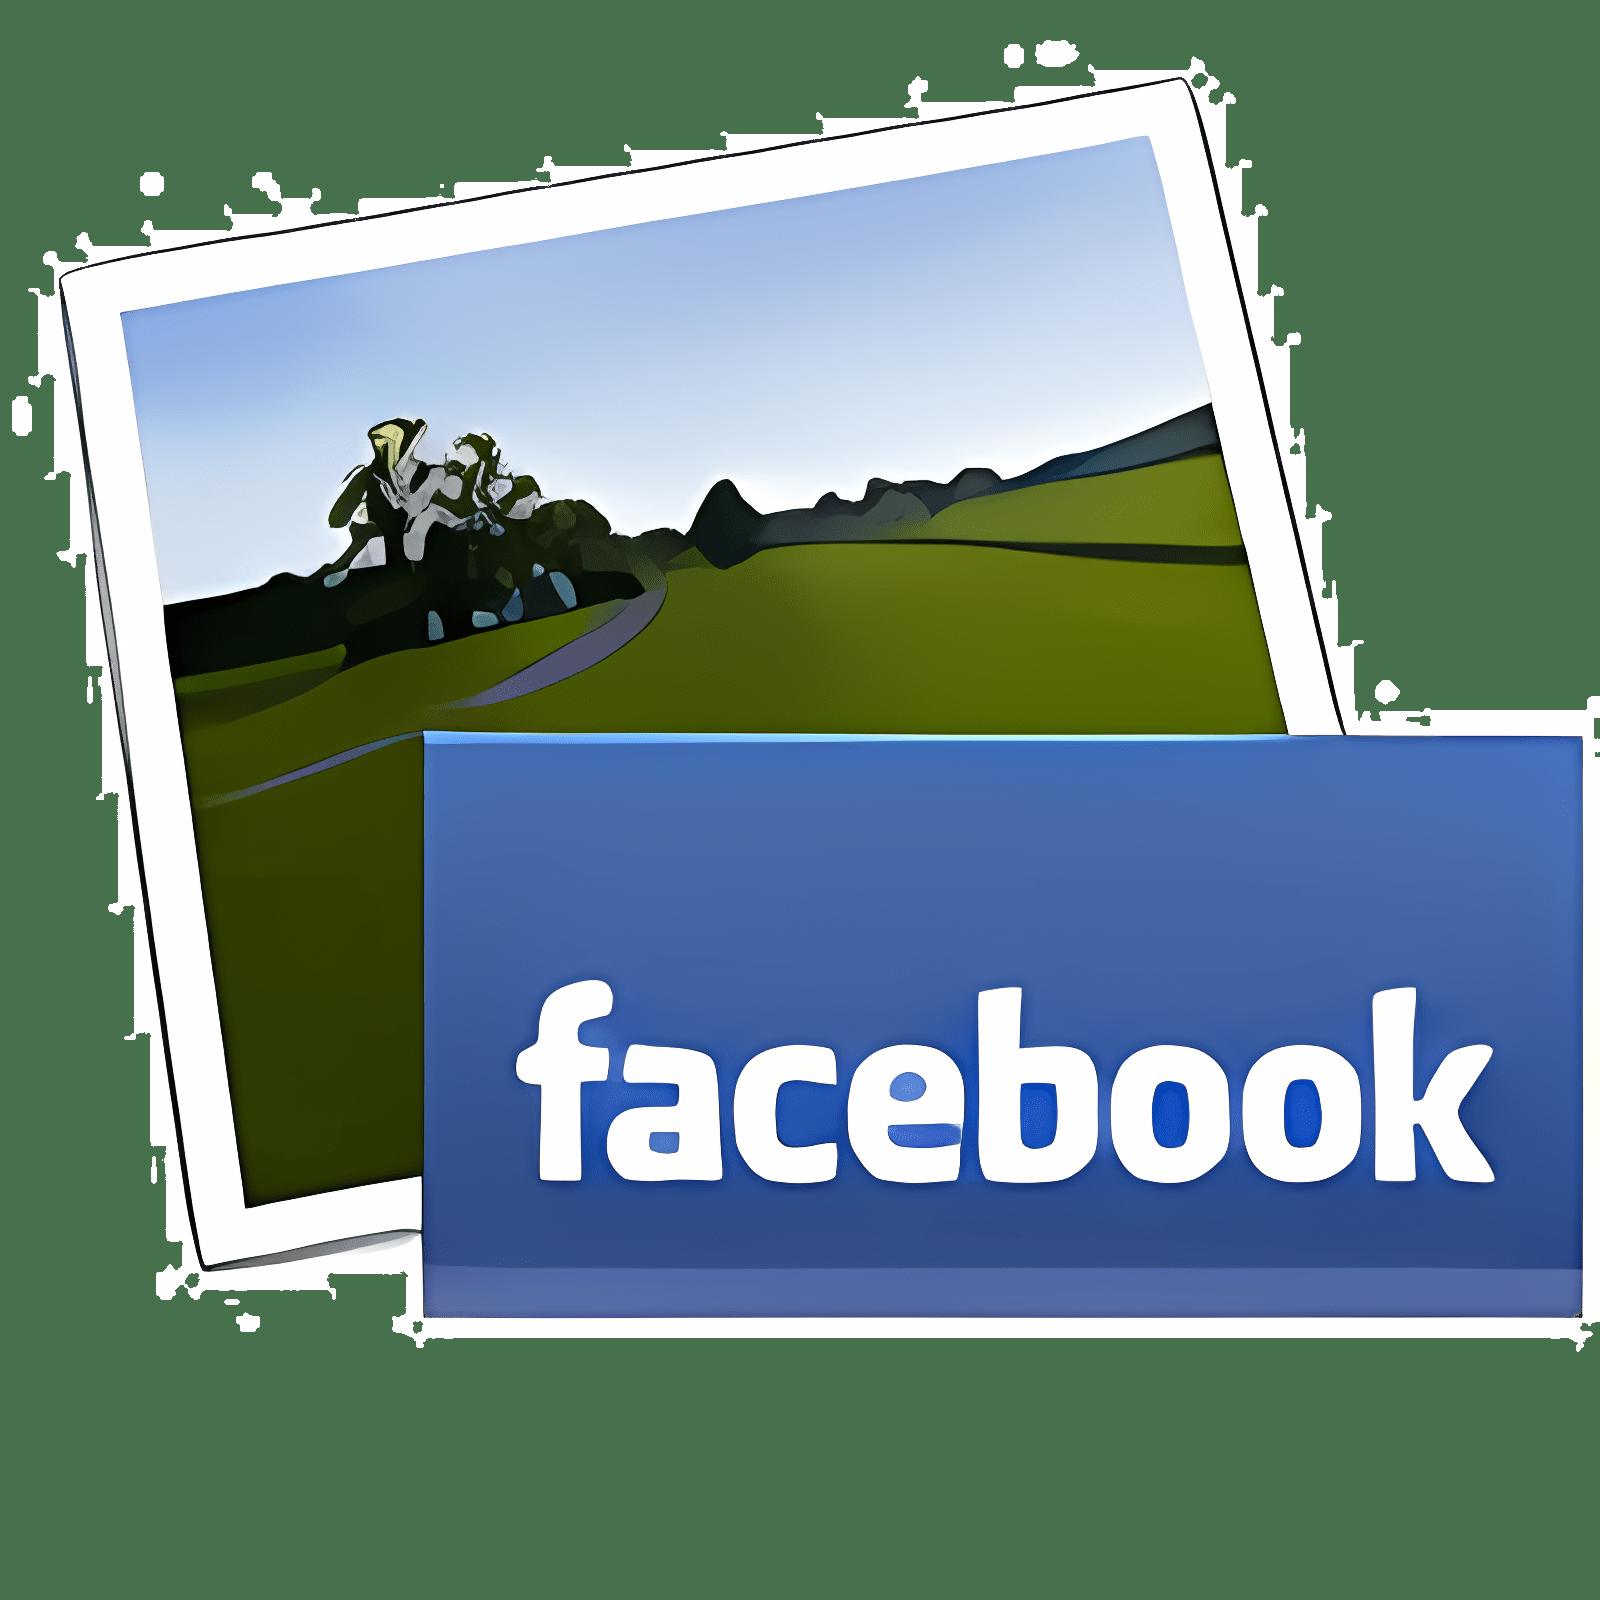 Facebook Exporter for iPhoto